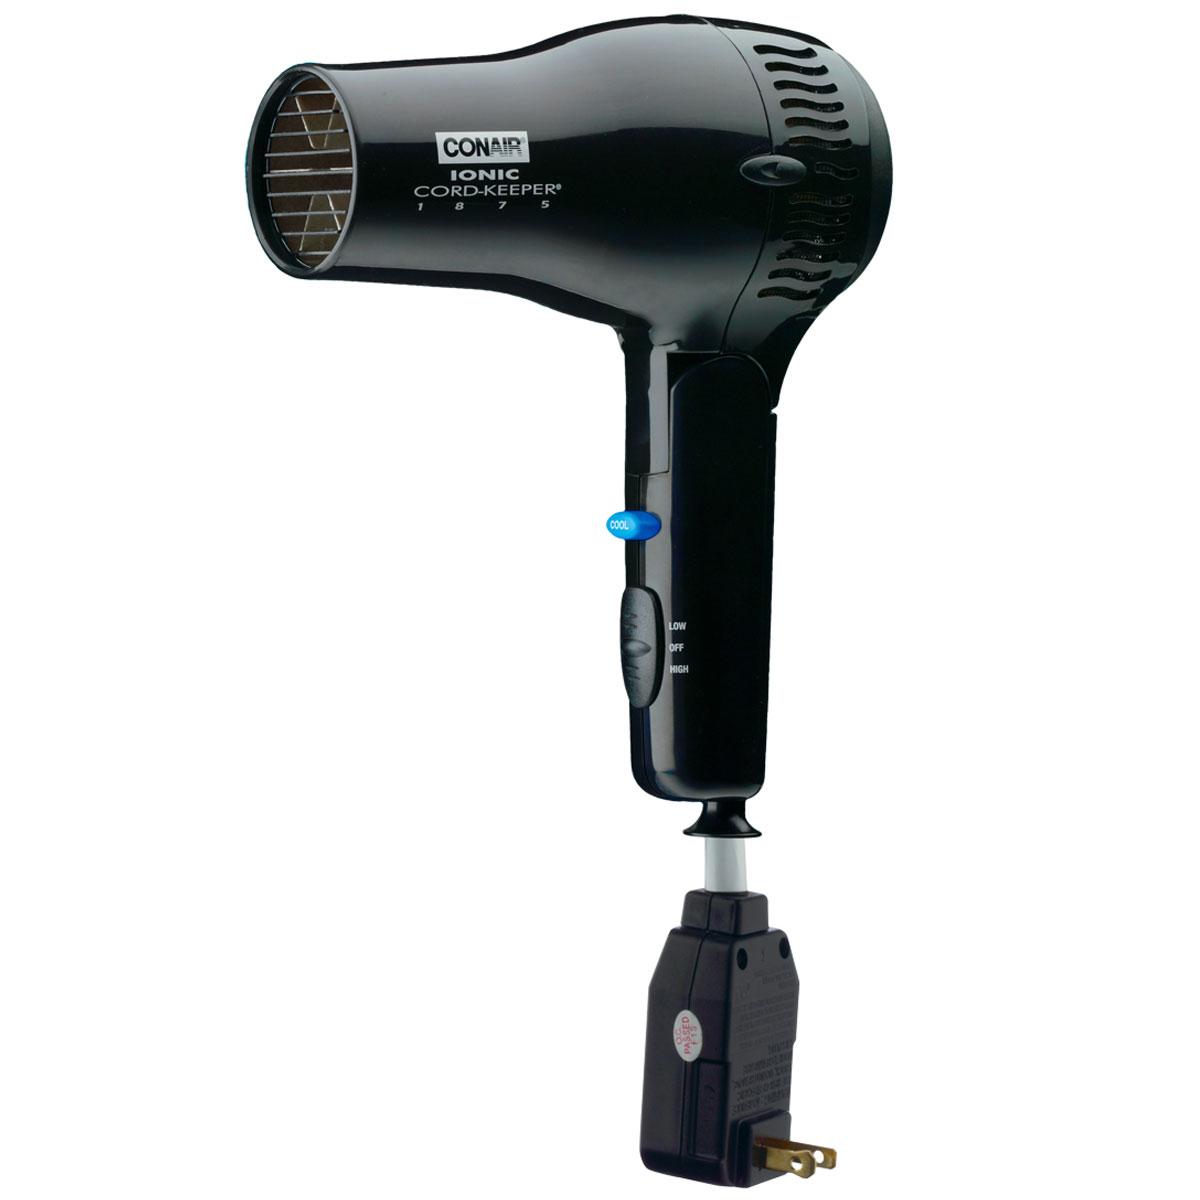 Conair 1875 Dryer ~ Conair biw watt ionic cord keeper dryer hair